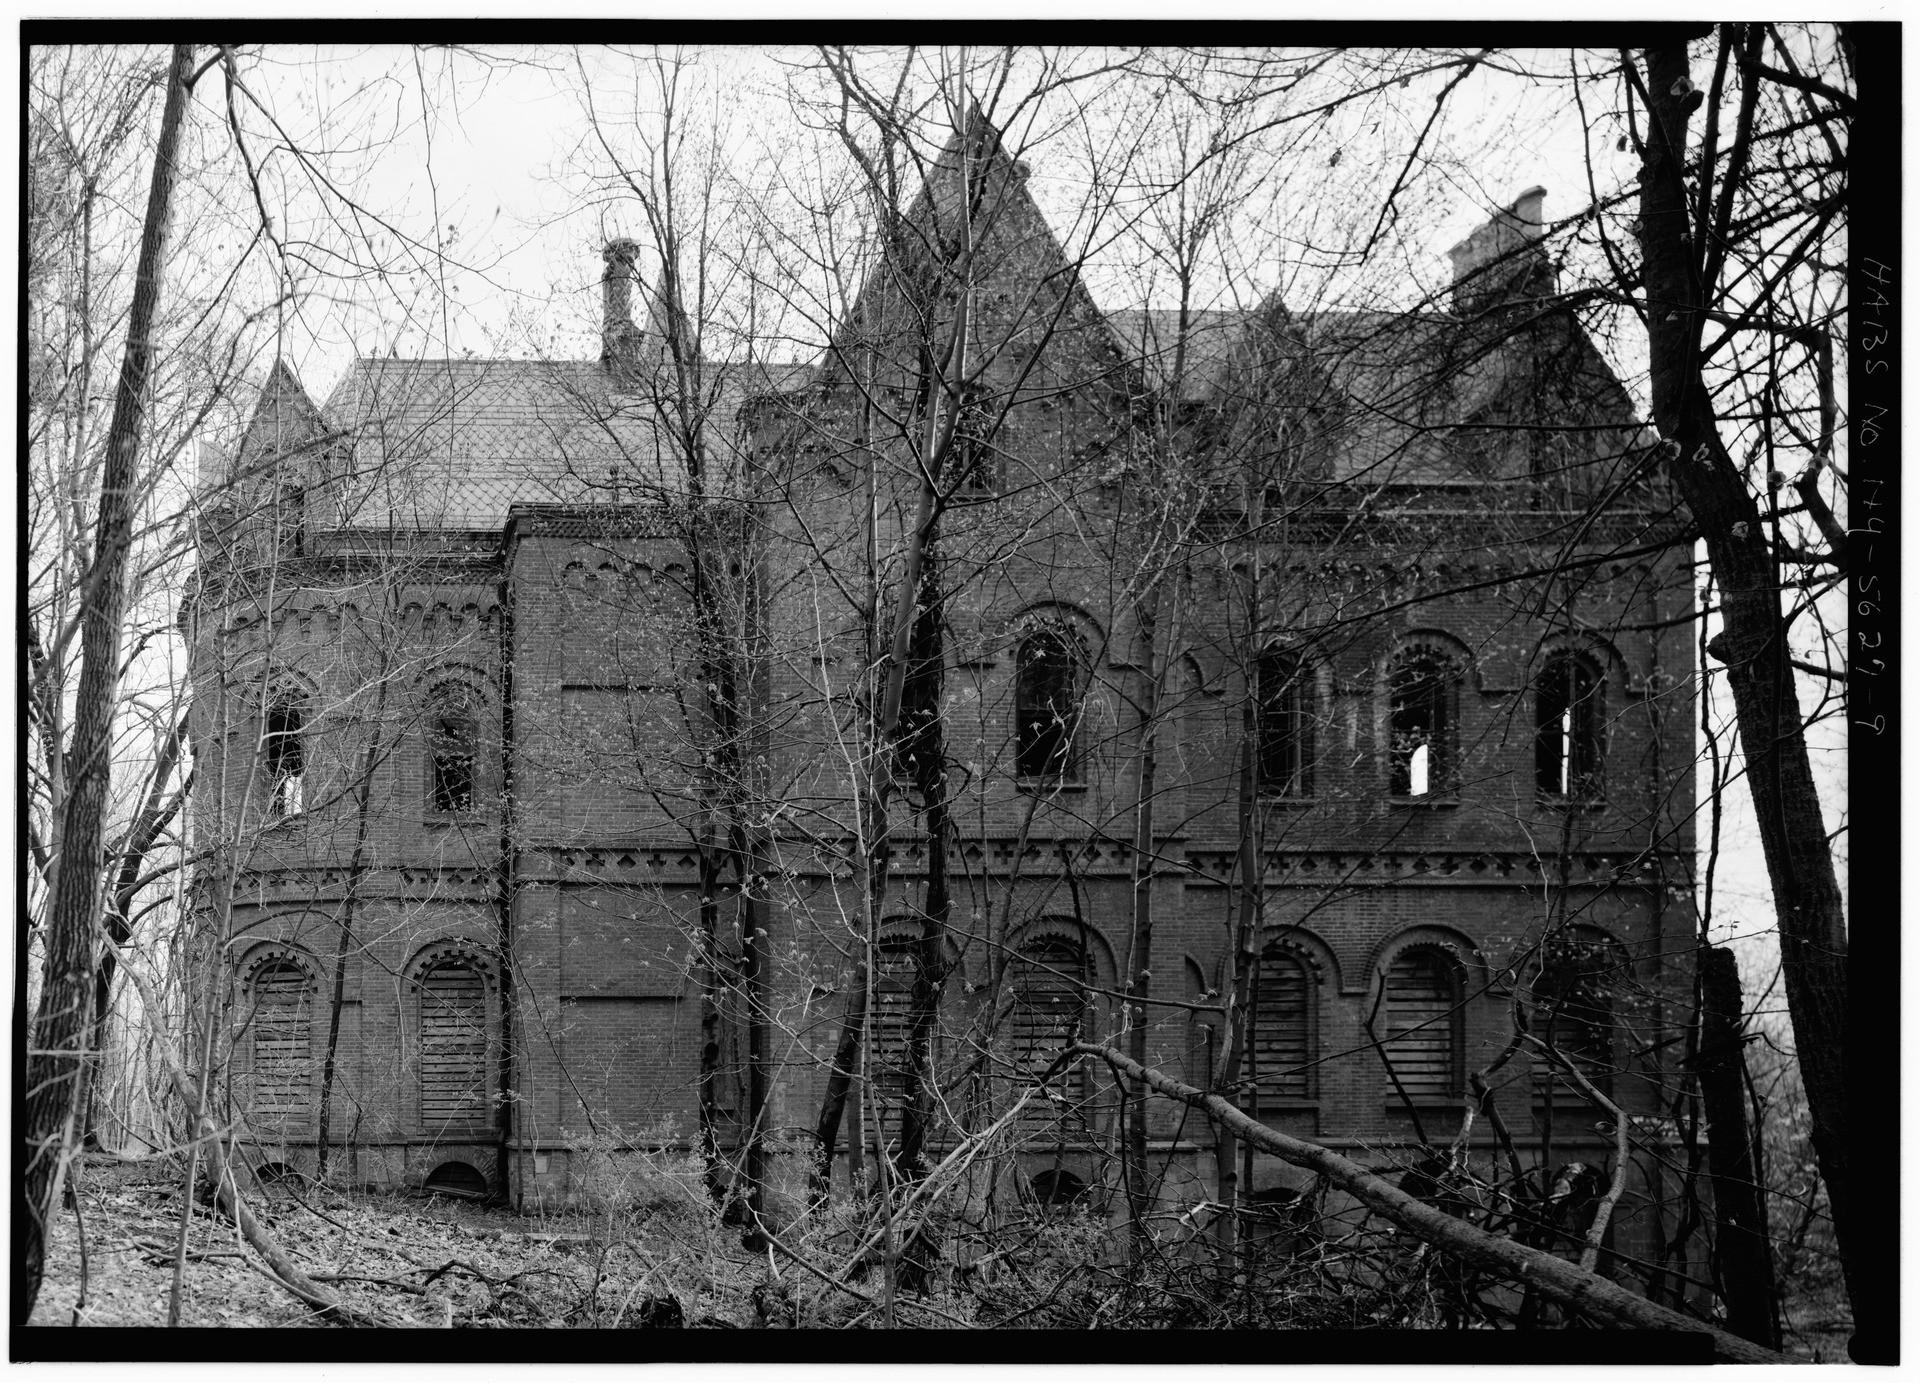 Wyndclyffe Castle